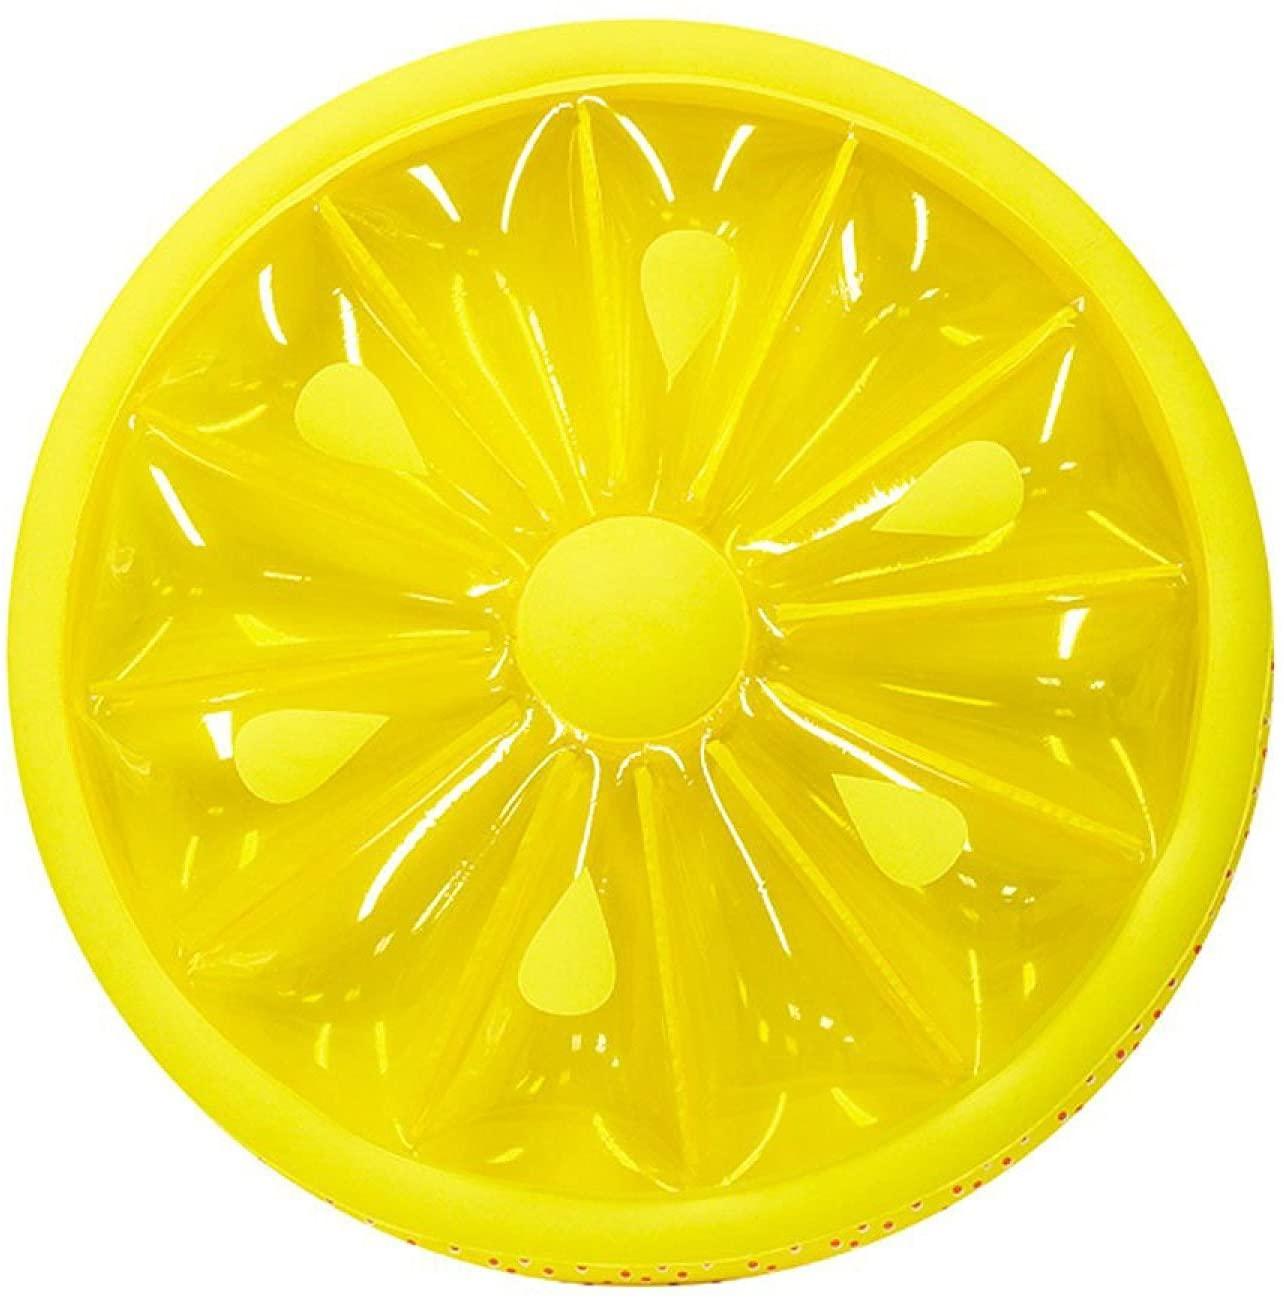 Feeryou Swim Ring Lemon Shape PVC Swim Ring Inflatable Anti-Leakage Anti-Slip Suitable for Adults/Super Strong